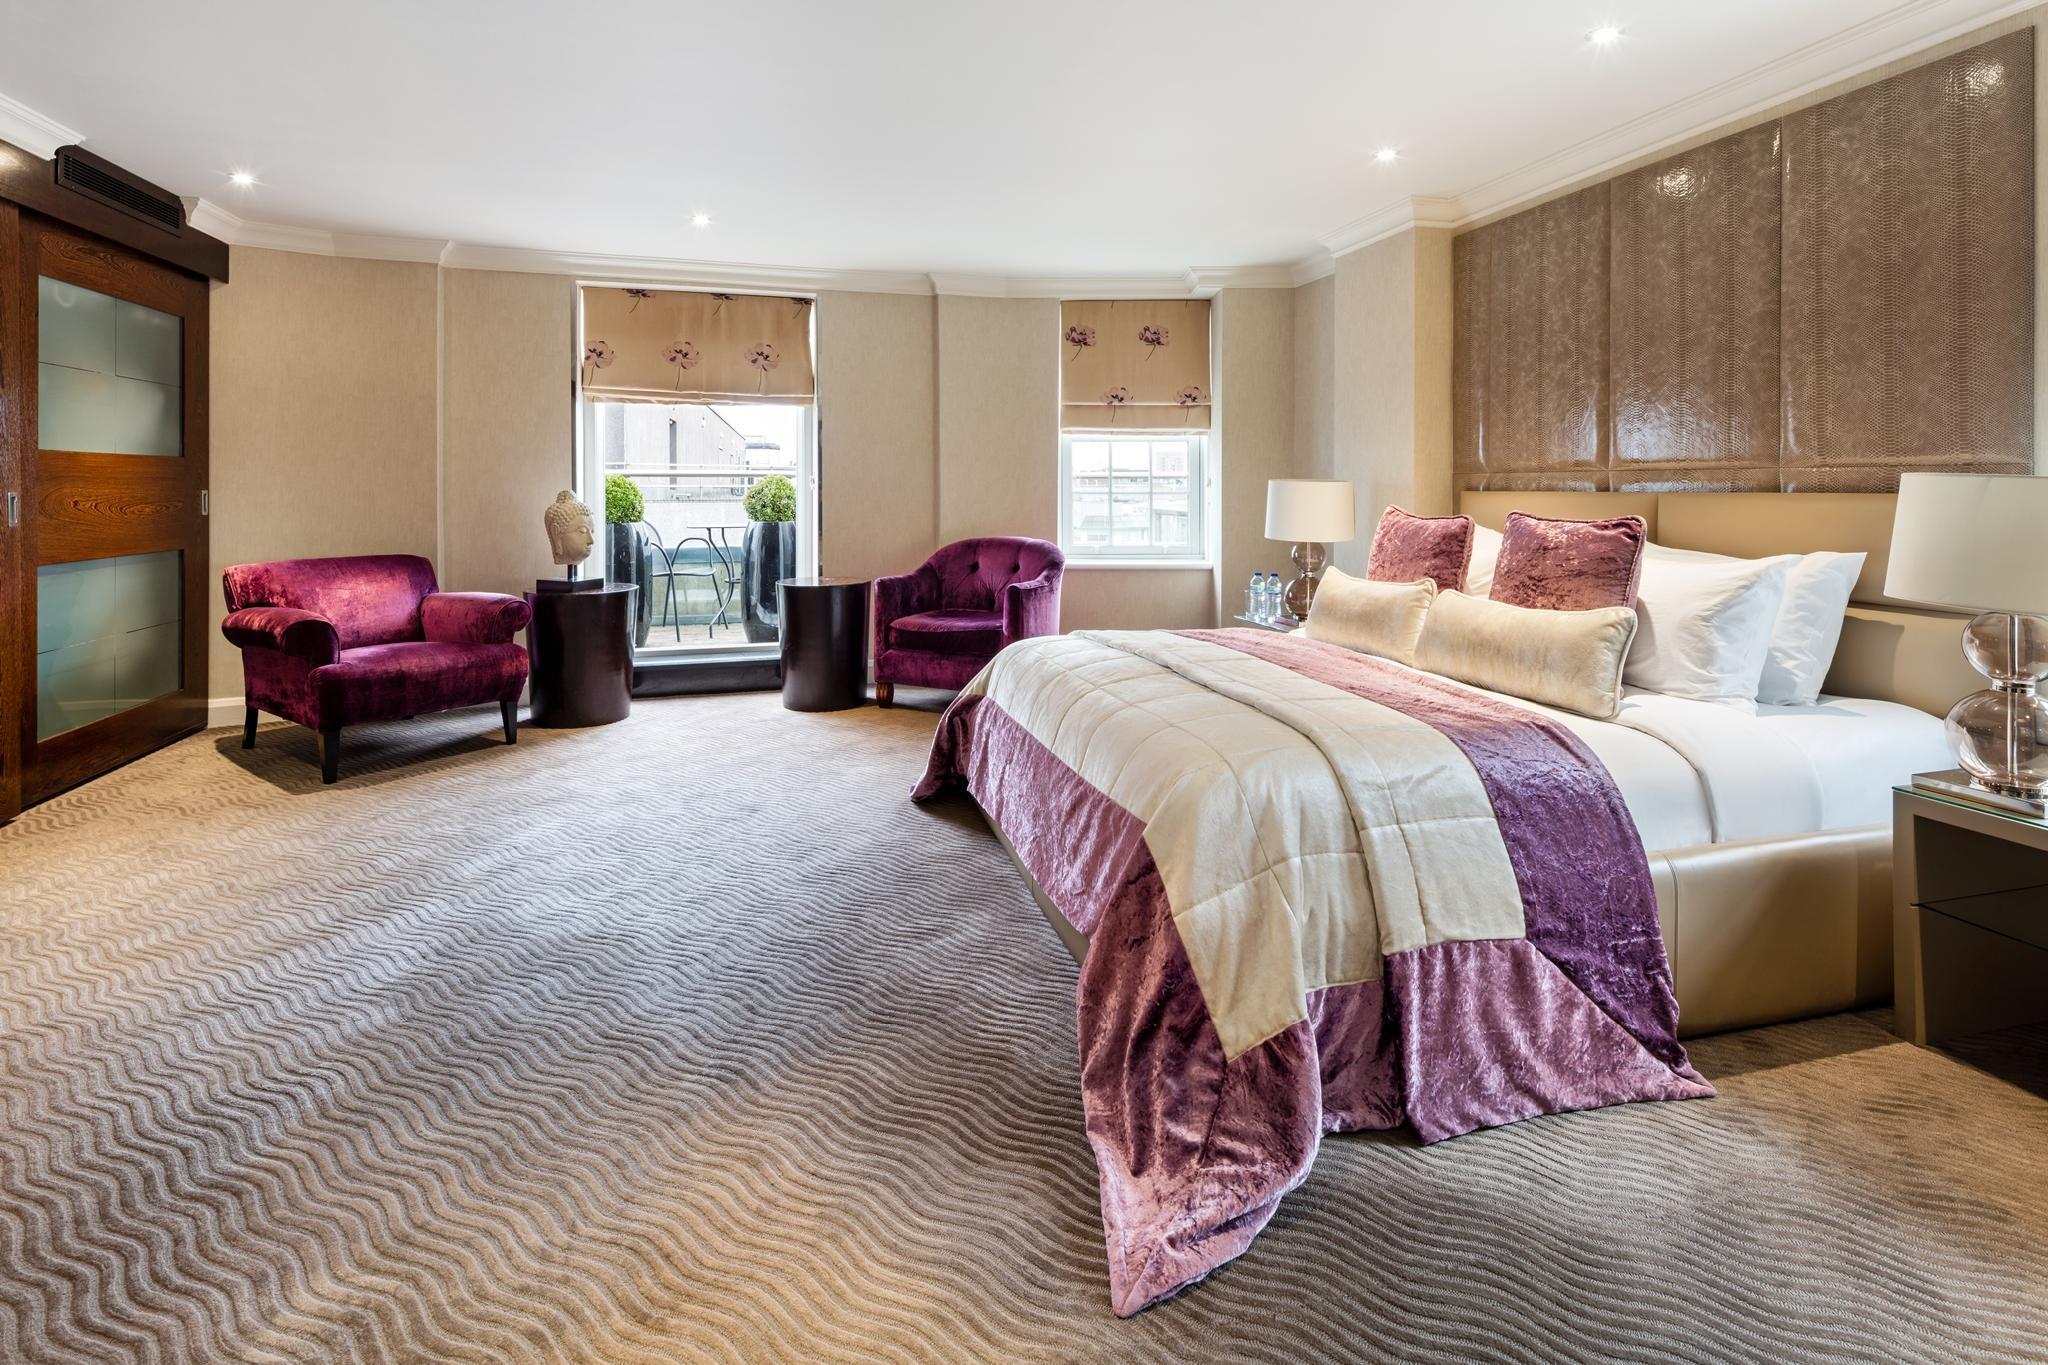 Radisson Blu Edwardian Berkshire Hotel